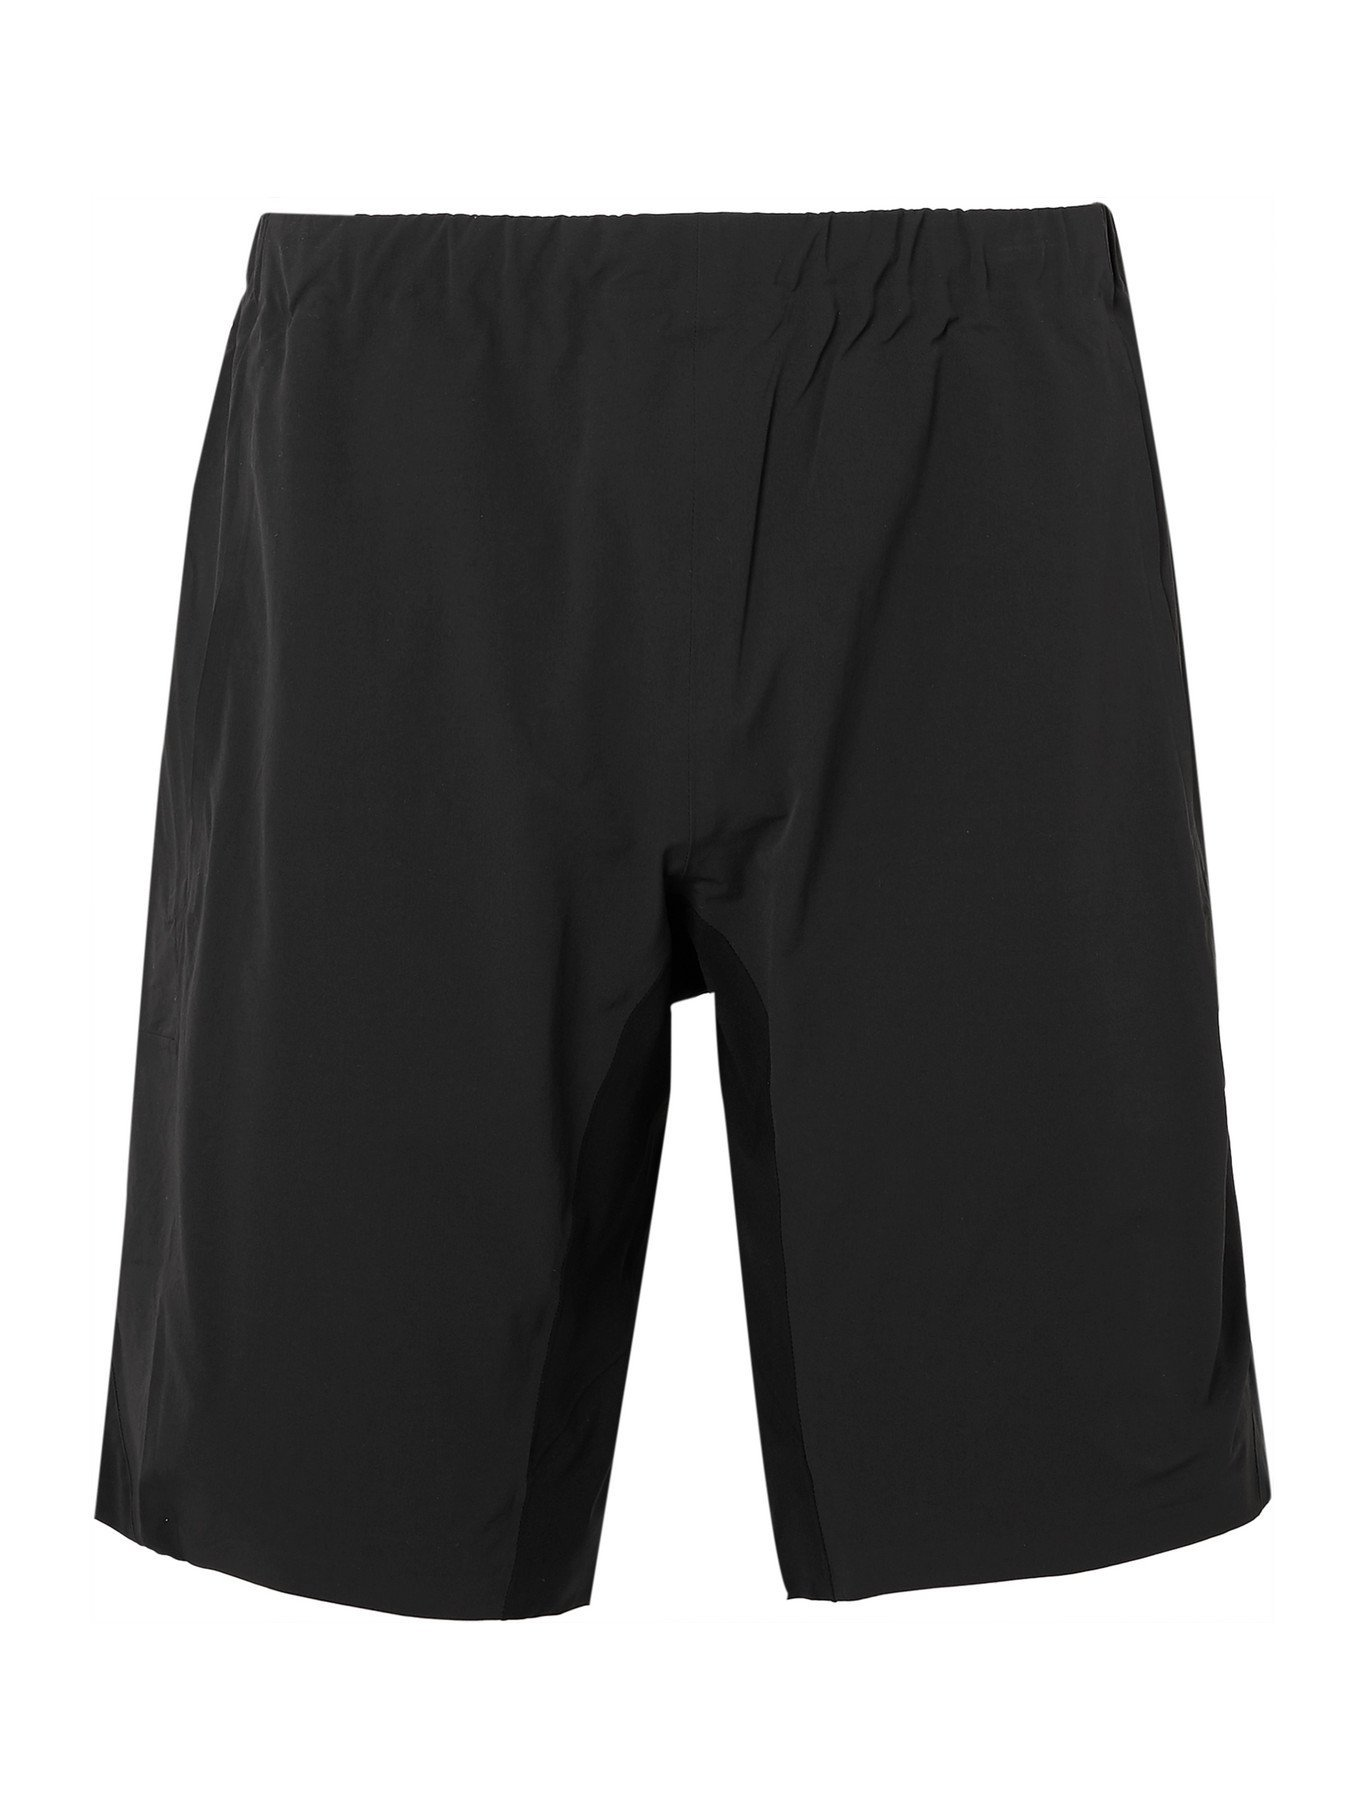 Photo: VEILANCE - Secant Comp Stretch-Shell Shorts - Black - S